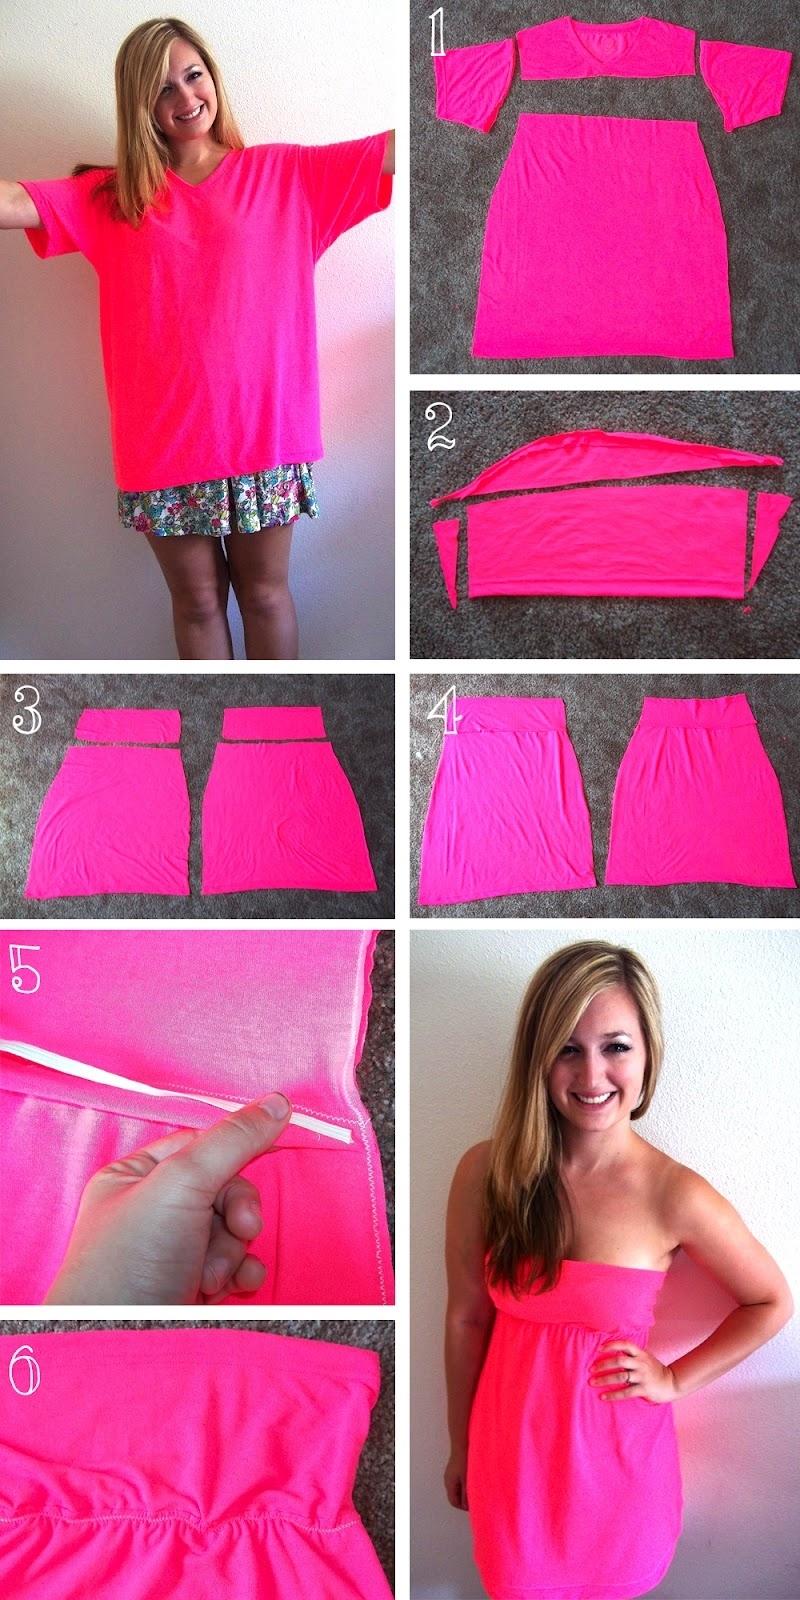 How To Turn A Tshirt Into A Tube Top : tshirt, T-Shirt, Perfect, Summer